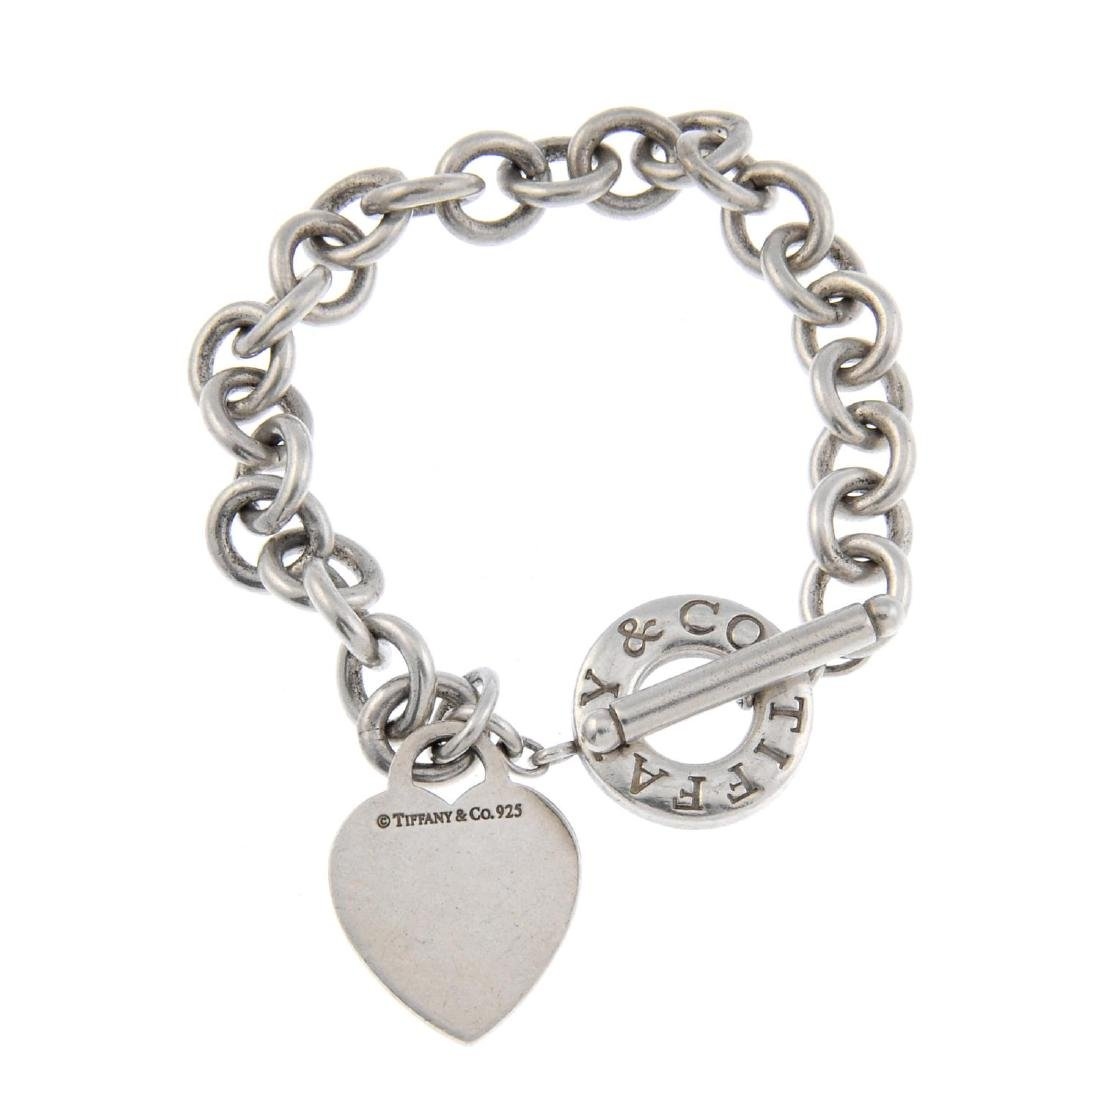 TIFFANY & CO. - a belcher-link necklace and bracelet.